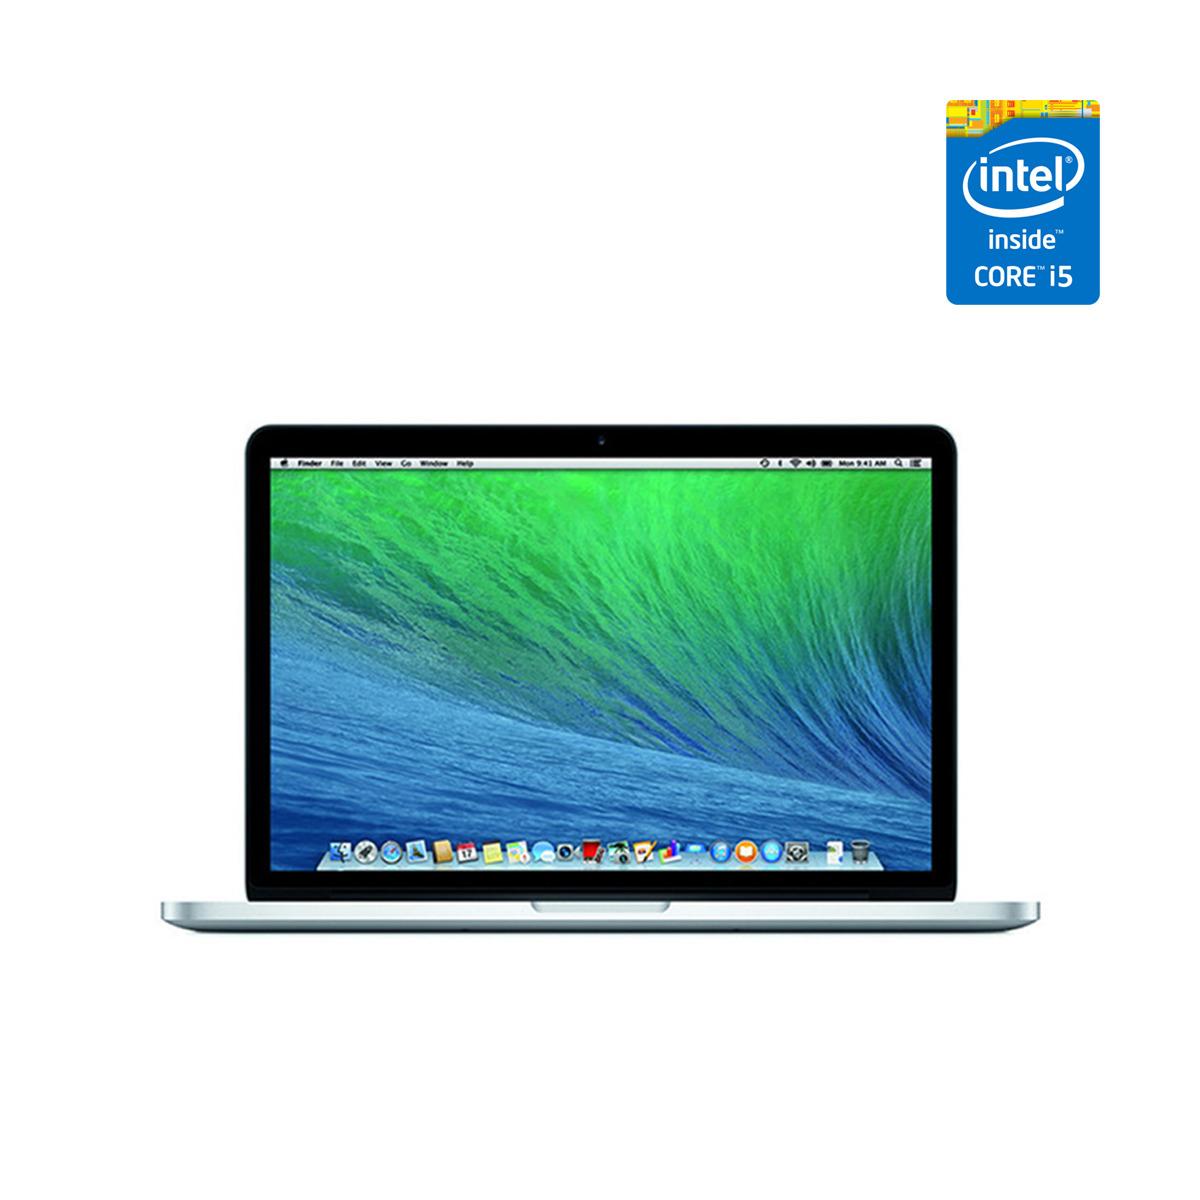 REACO Apple MacBook Pro 13 MD101Y/A Intel Core i5